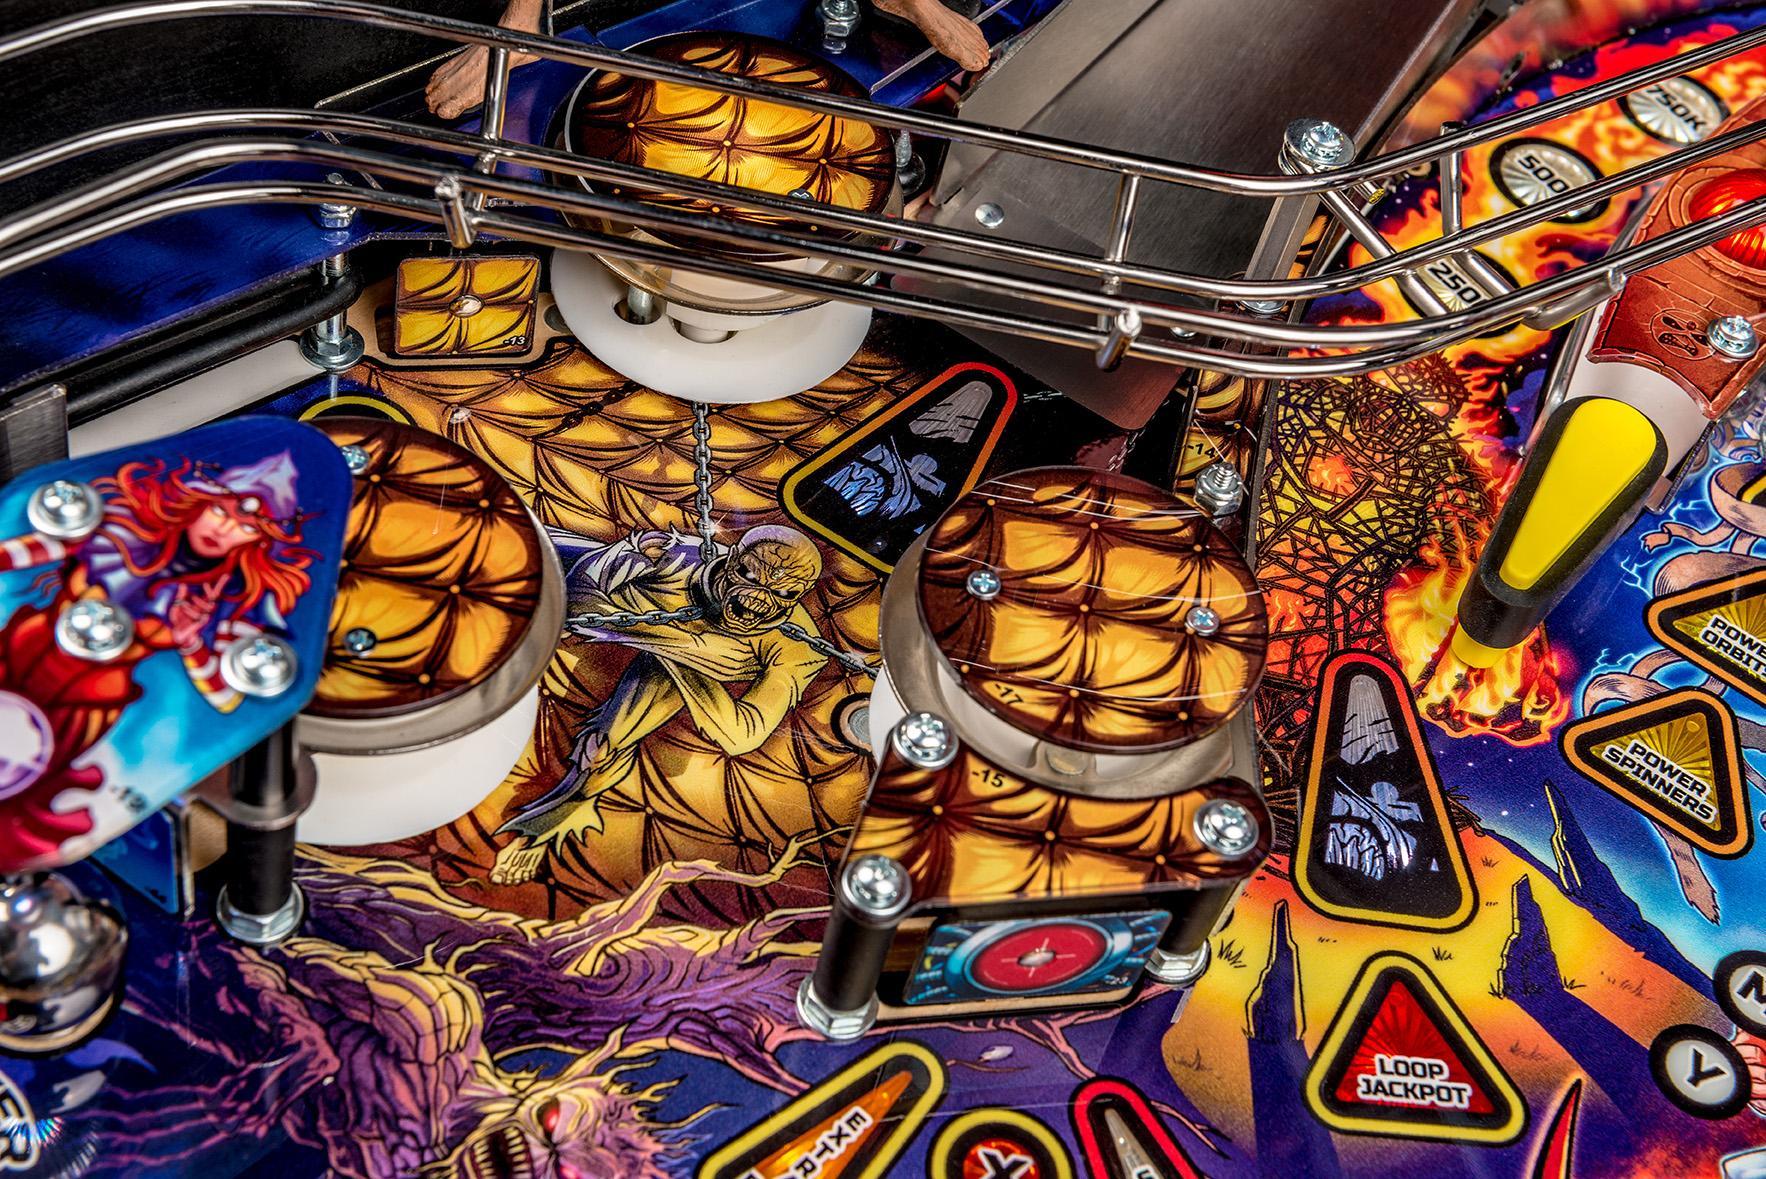 Iron-Maiden-Pinball-Machine-23a